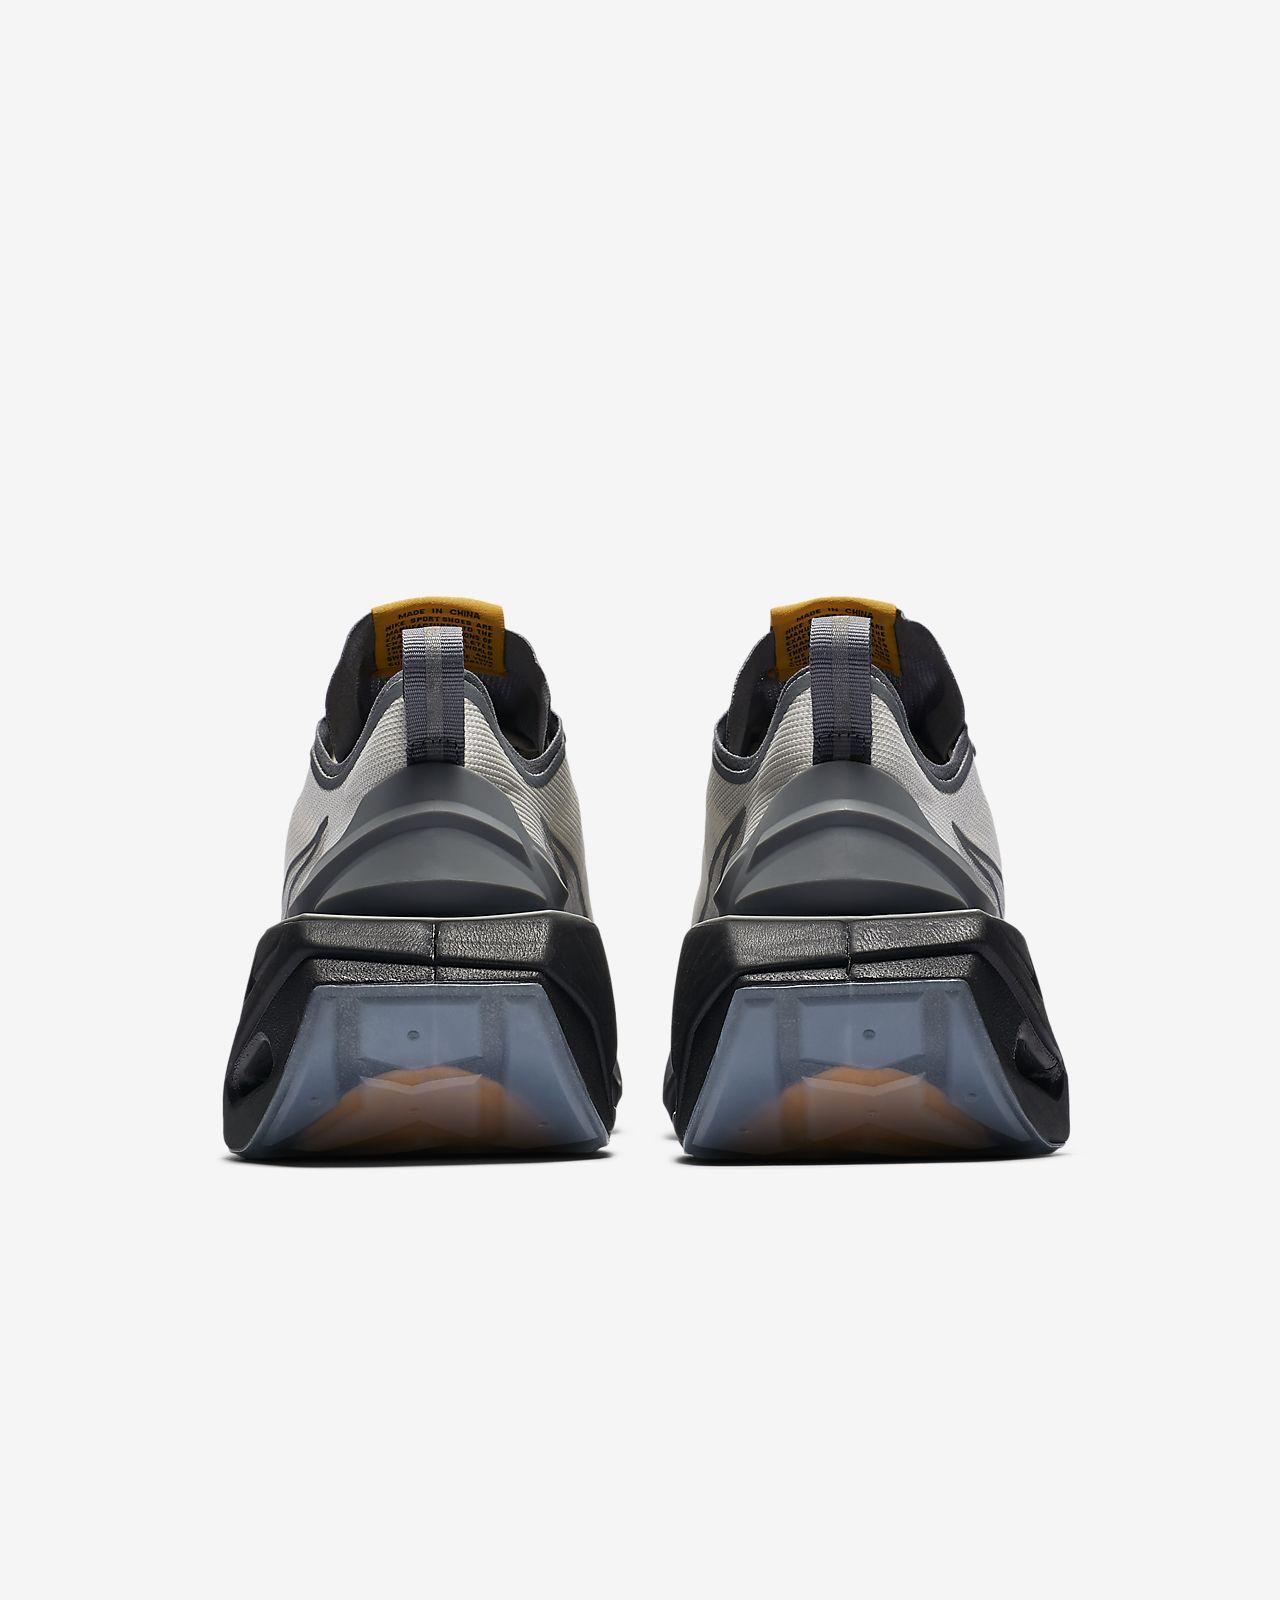 Authentieke Schoenen: Hurley Phantom Free (USA) Sandalen Gym